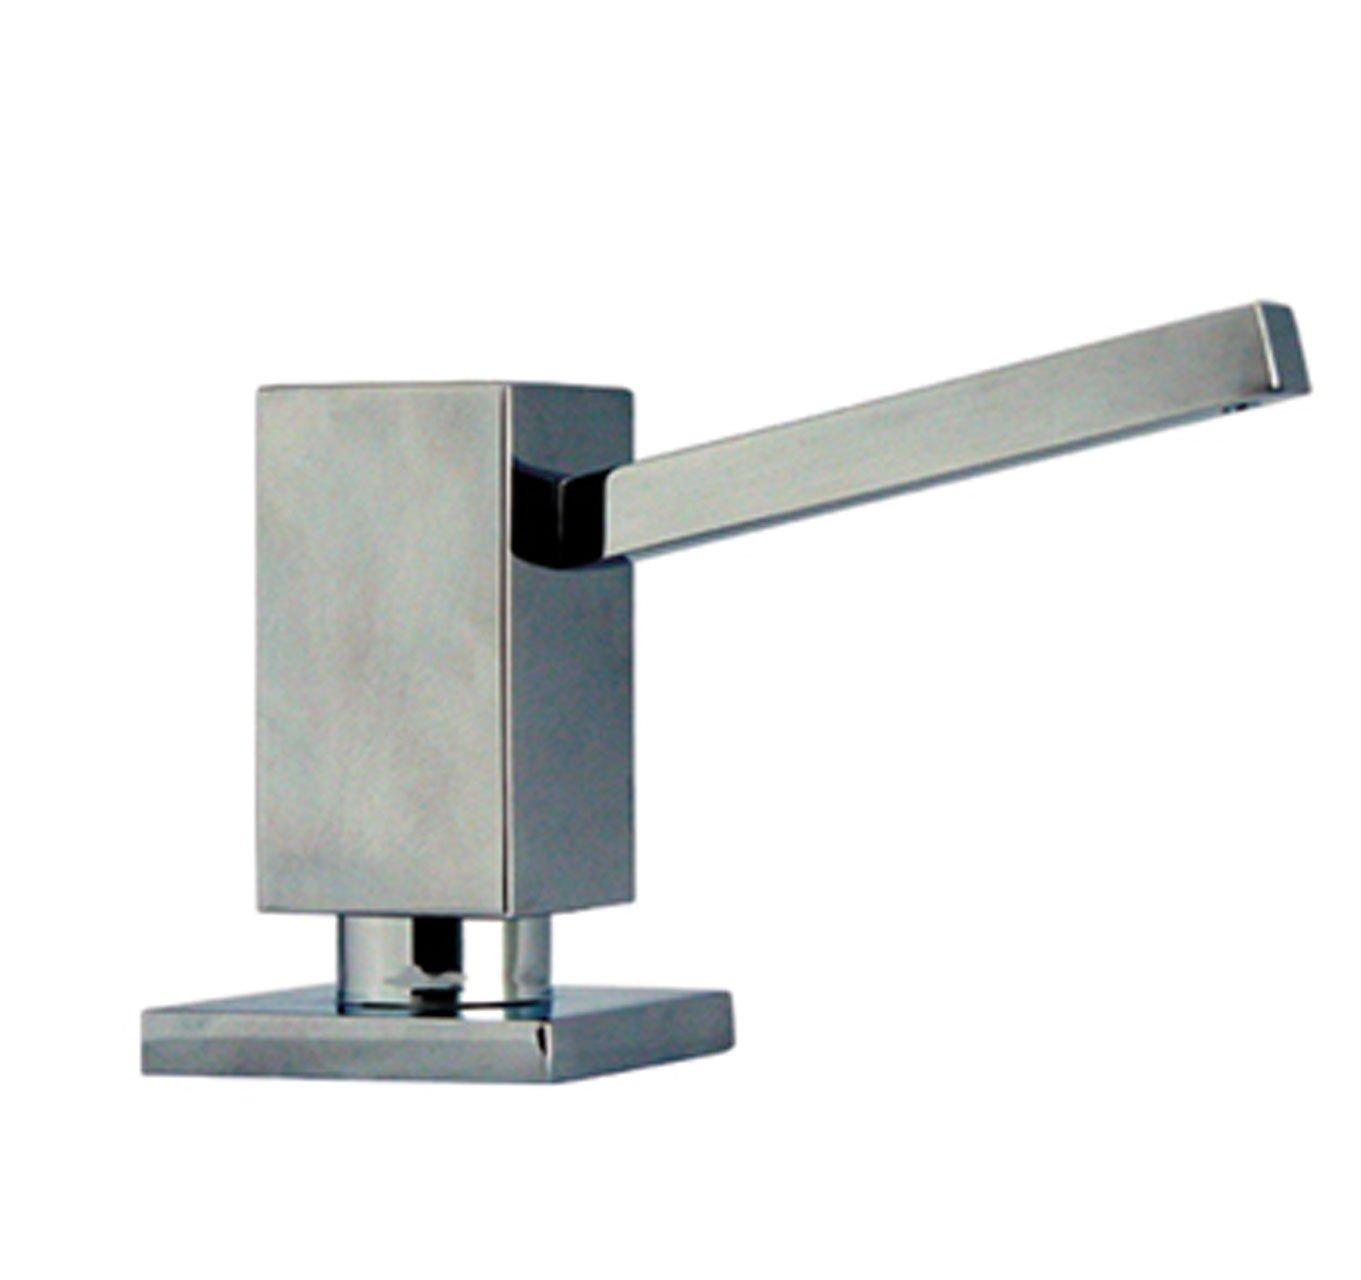 Whitehaus WHSQ-SD003-POCH Q-Haus 3 3/4-Inch Solid Brass Soap/Lotion Dispenser